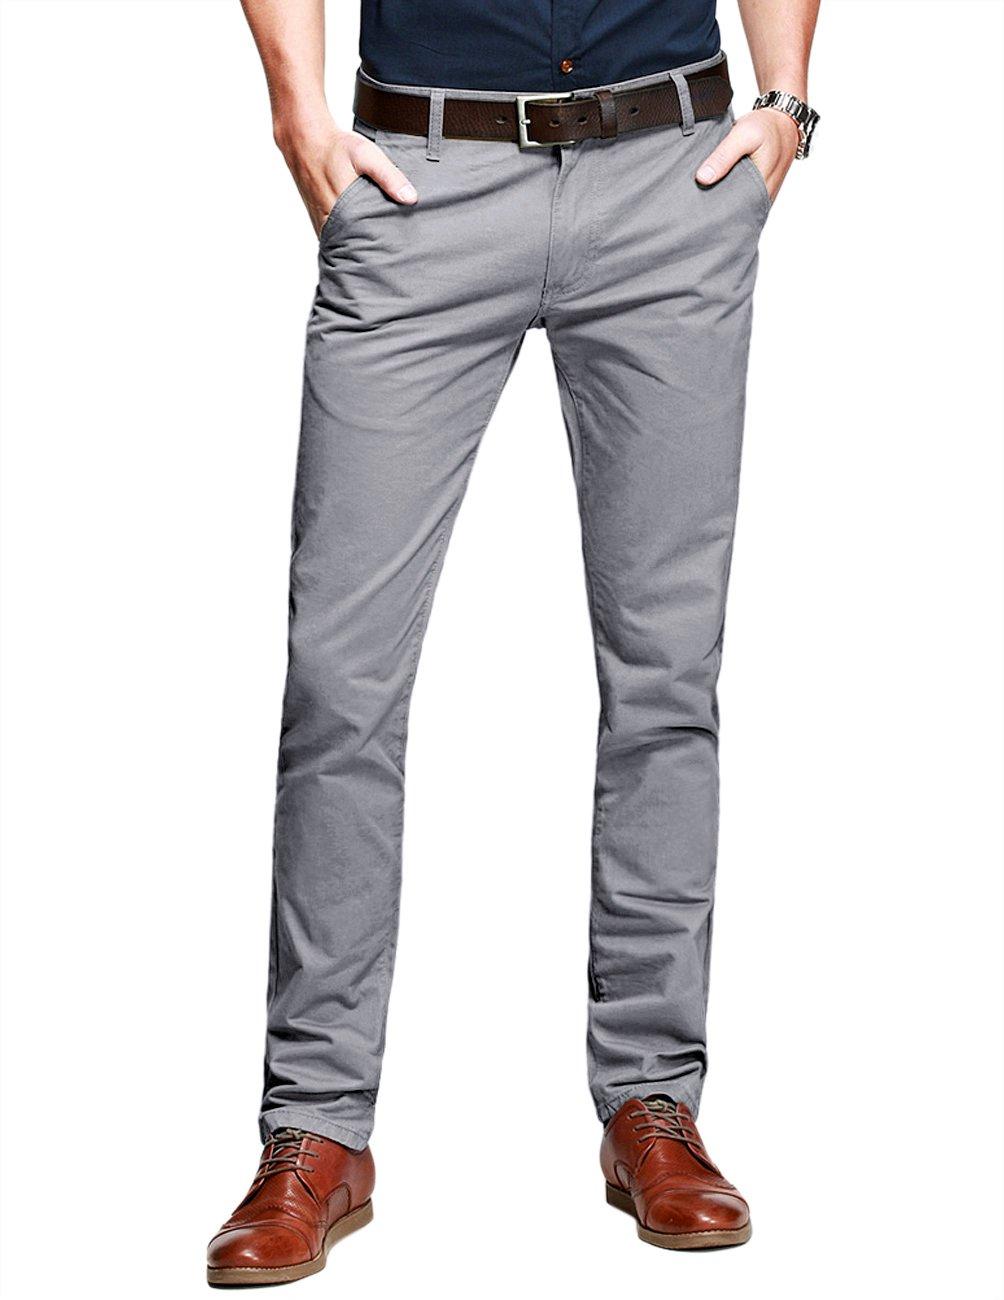 Match Mens Slim-Tapered Flat-Front Casual Pants(Medium Gray,38)